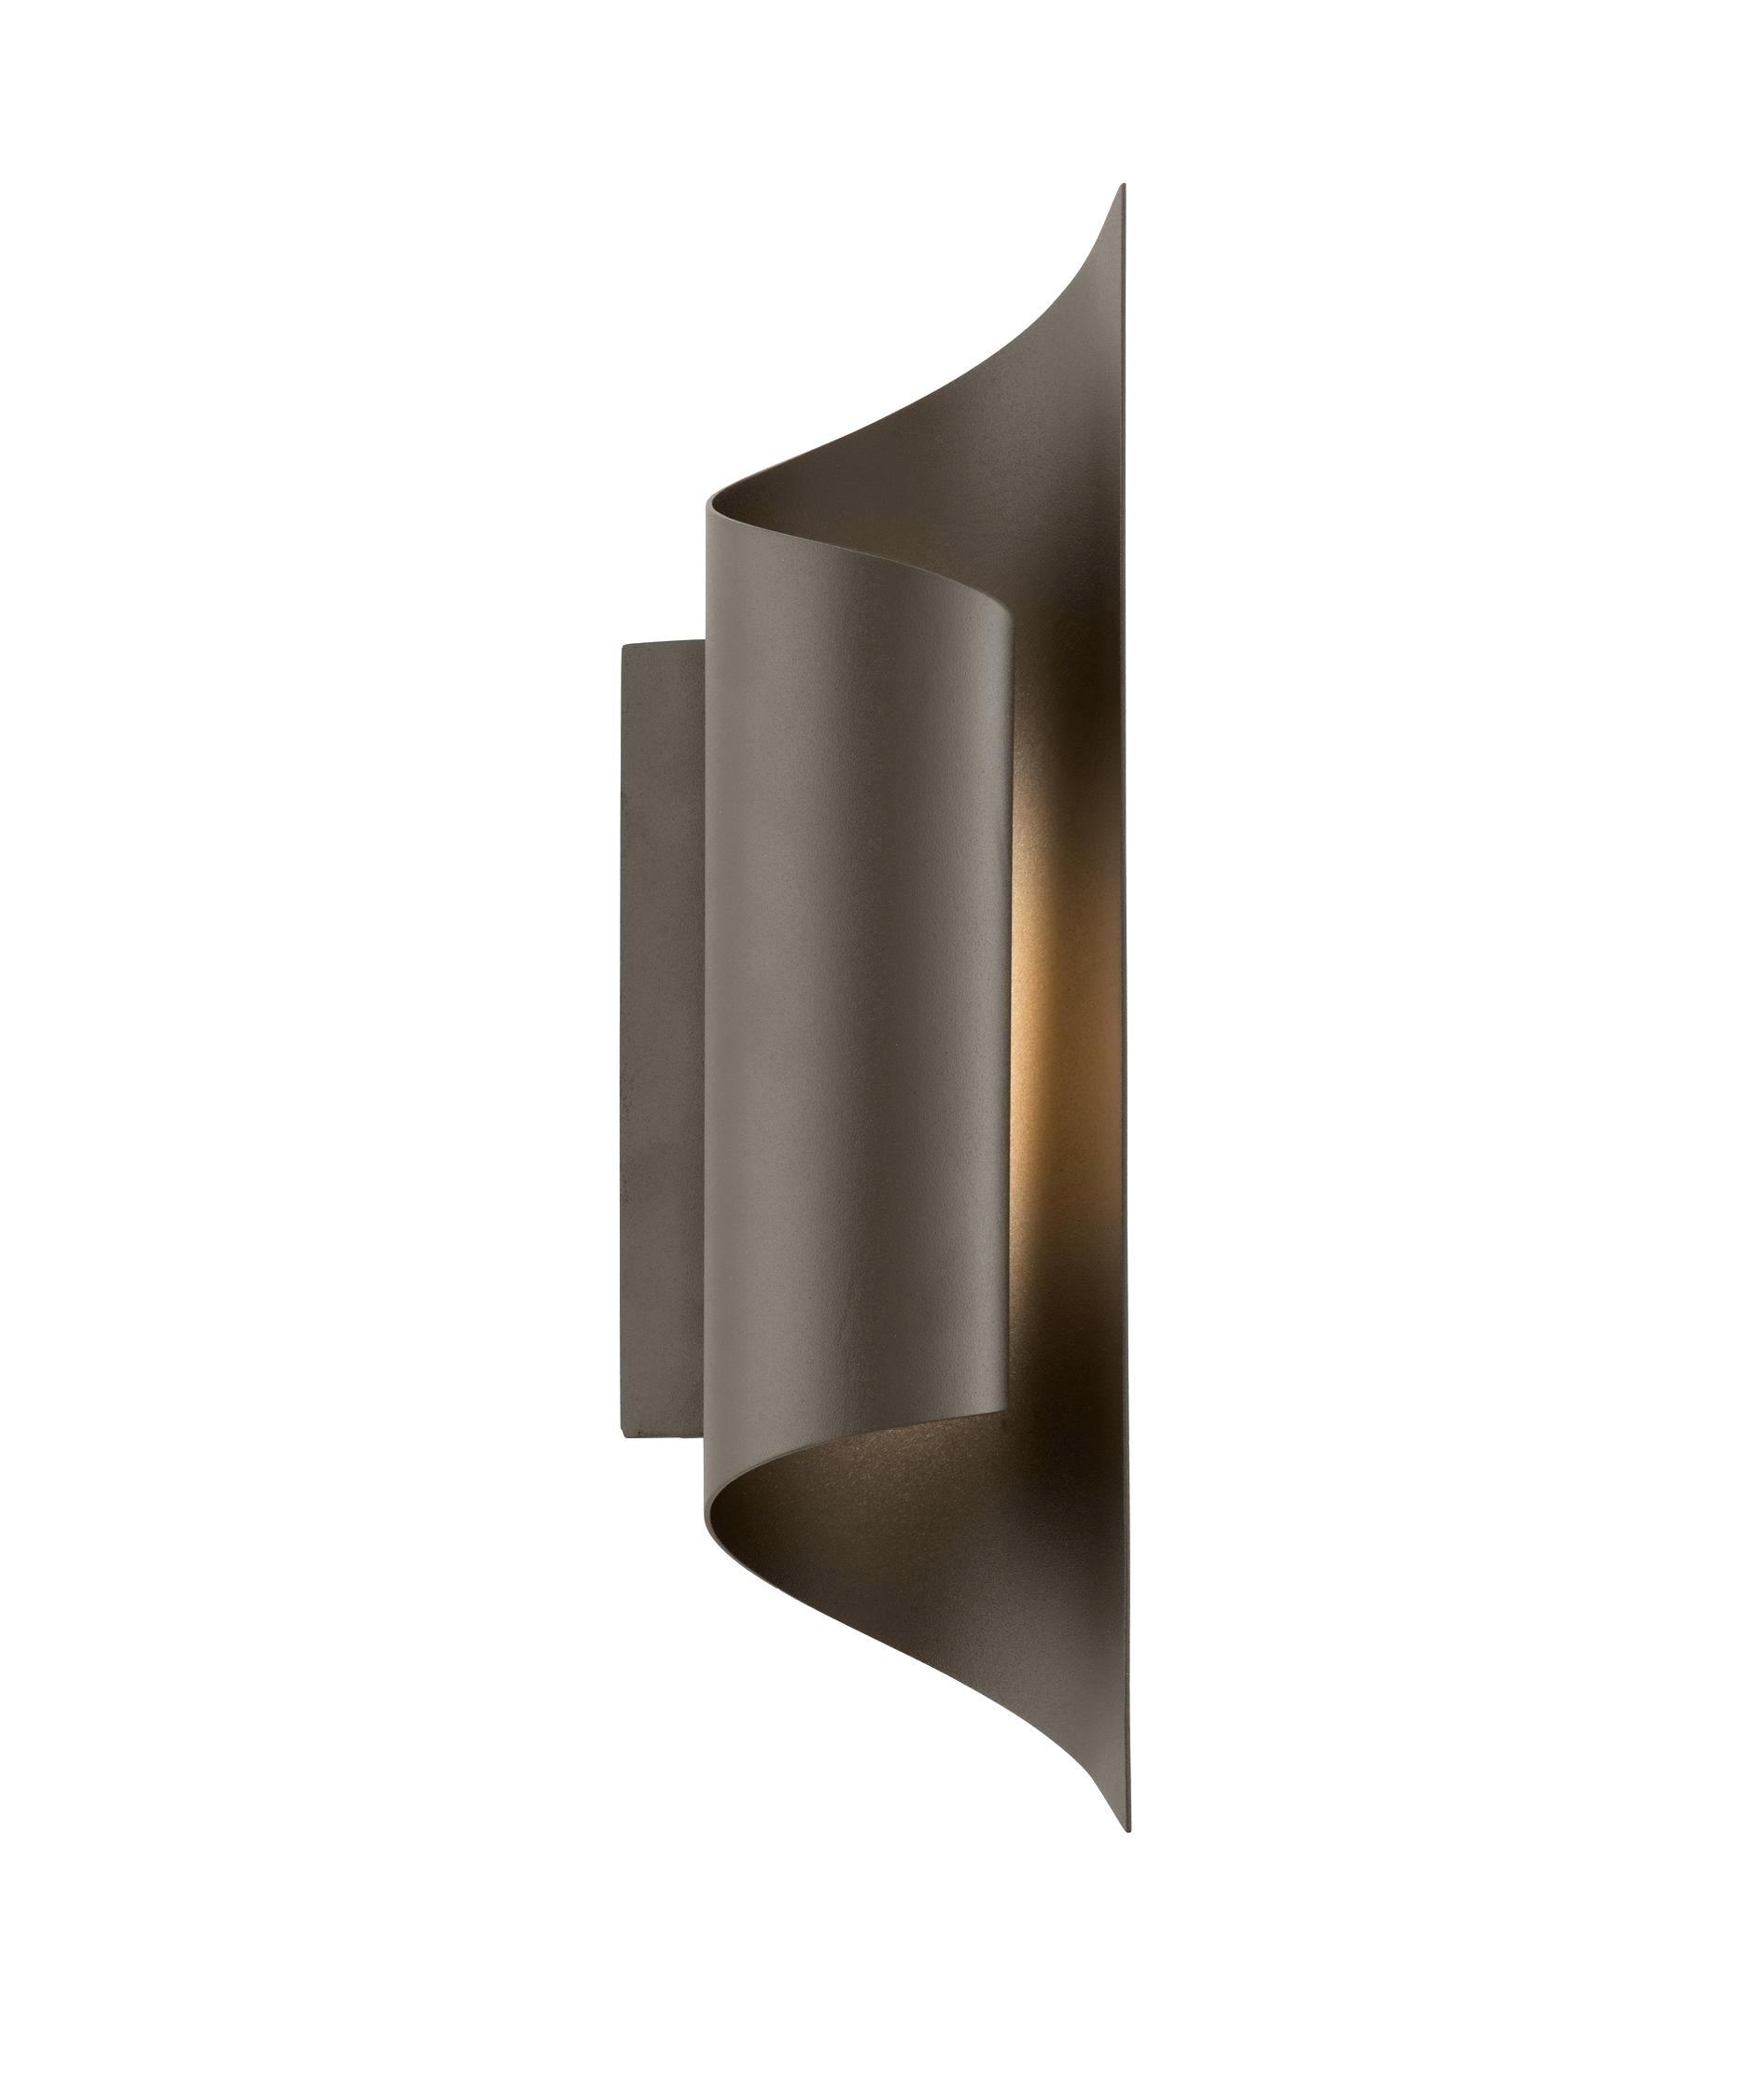 Outdoor Wall Light Lighting Ideas Lights Led Motion Sensor – In Eglo Lighting Sidney Outdoor Wall Lights With Motion Sensor (#11 of 15)